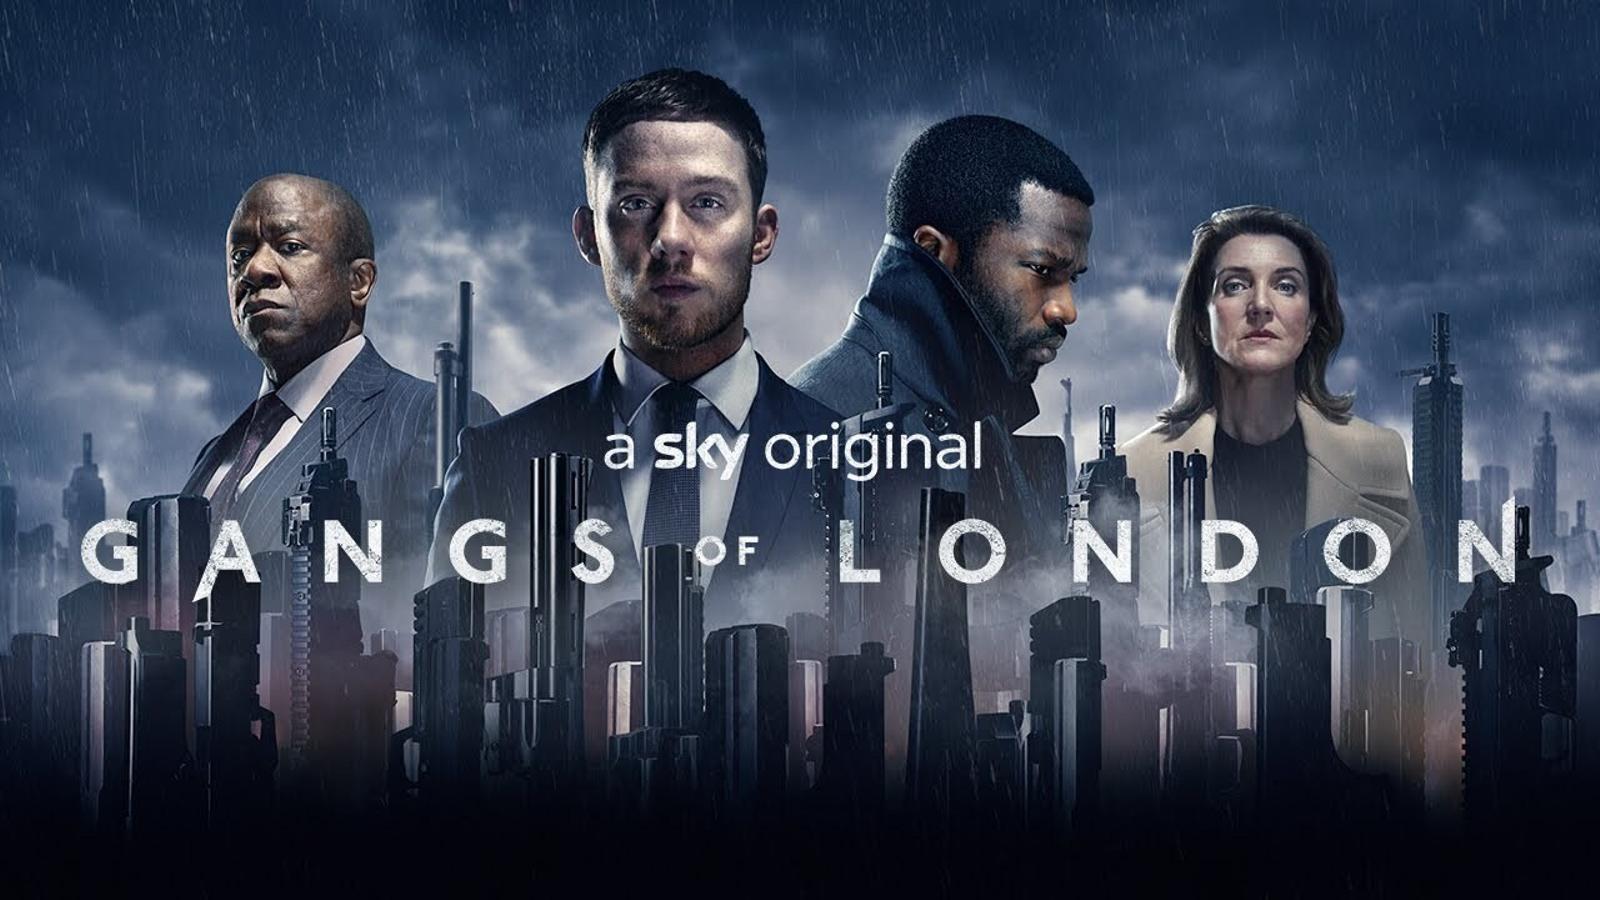 Sang, màfies i traïcions: arriba 'Gangs of London', l'últim fenomen britànic